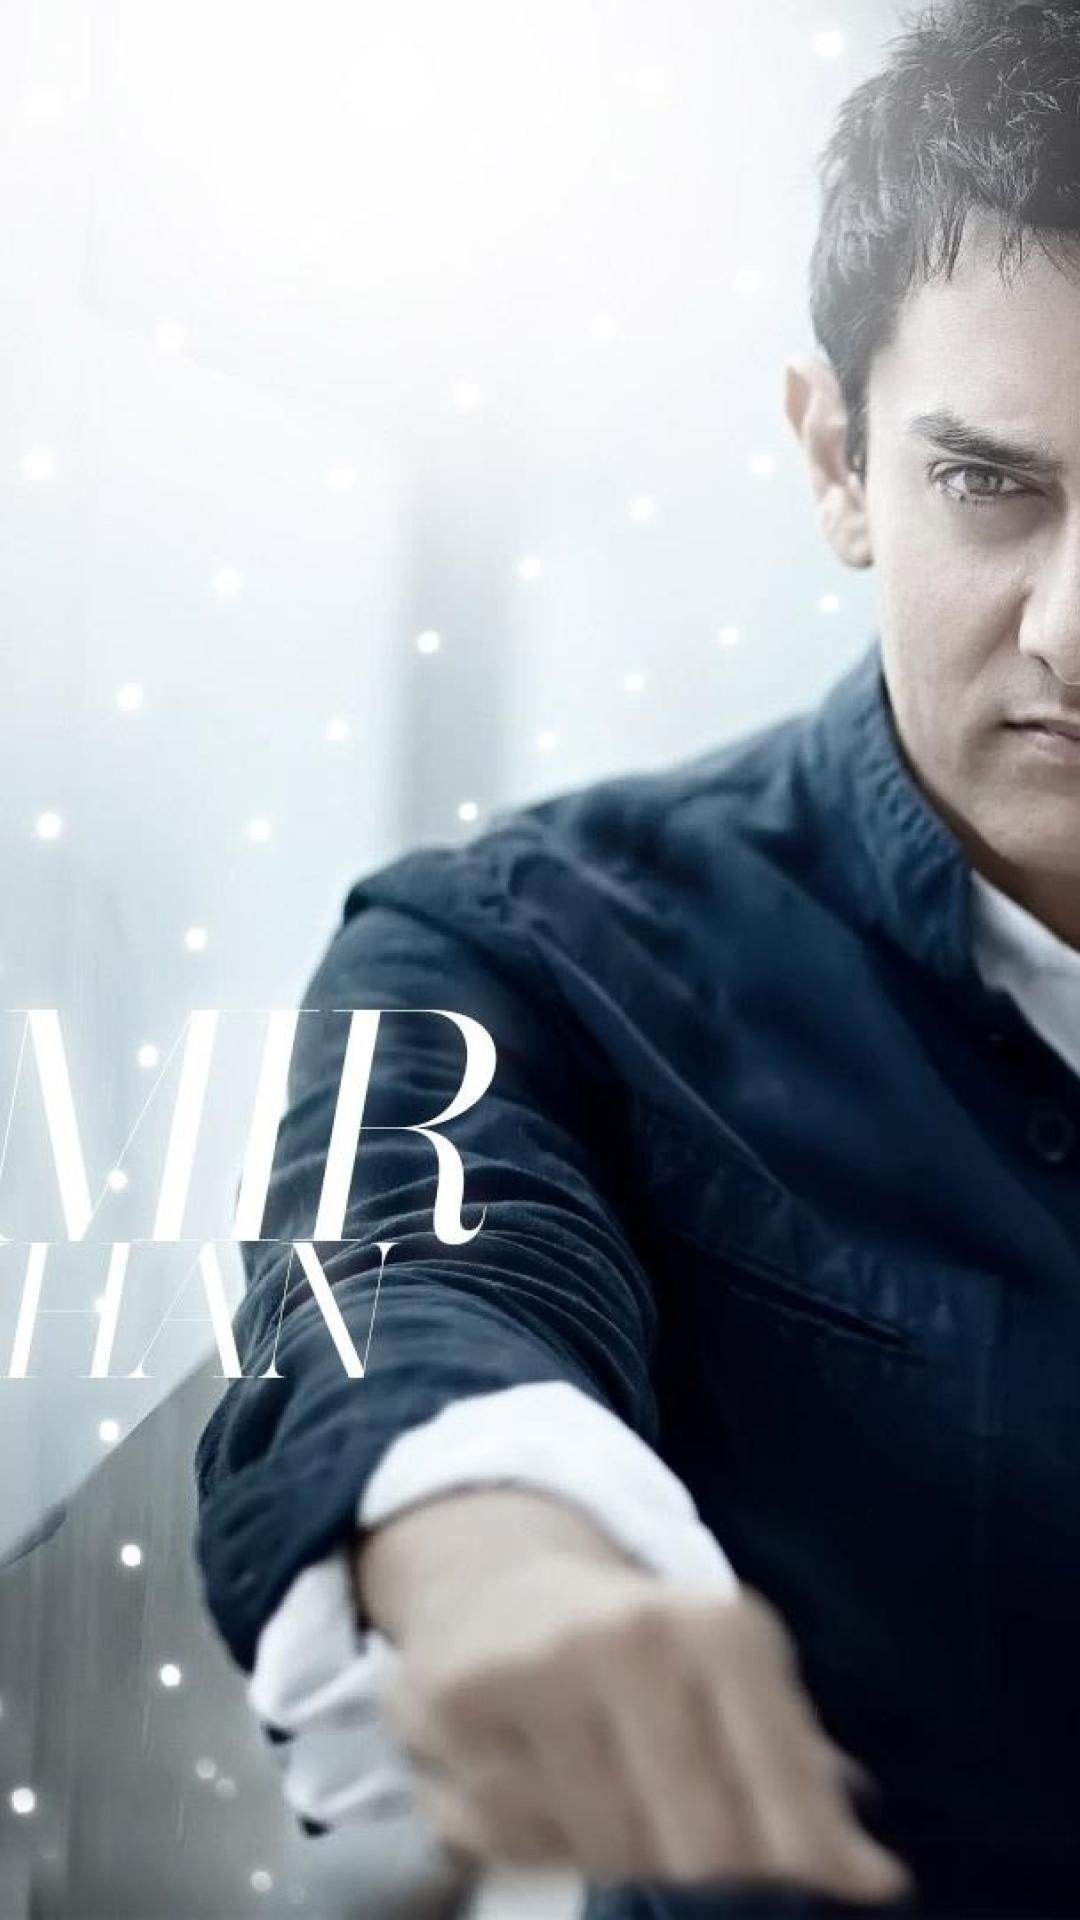 Aamir khan latest photoshoot full hd wallpaper - Aamir khan hd wallpaper ...